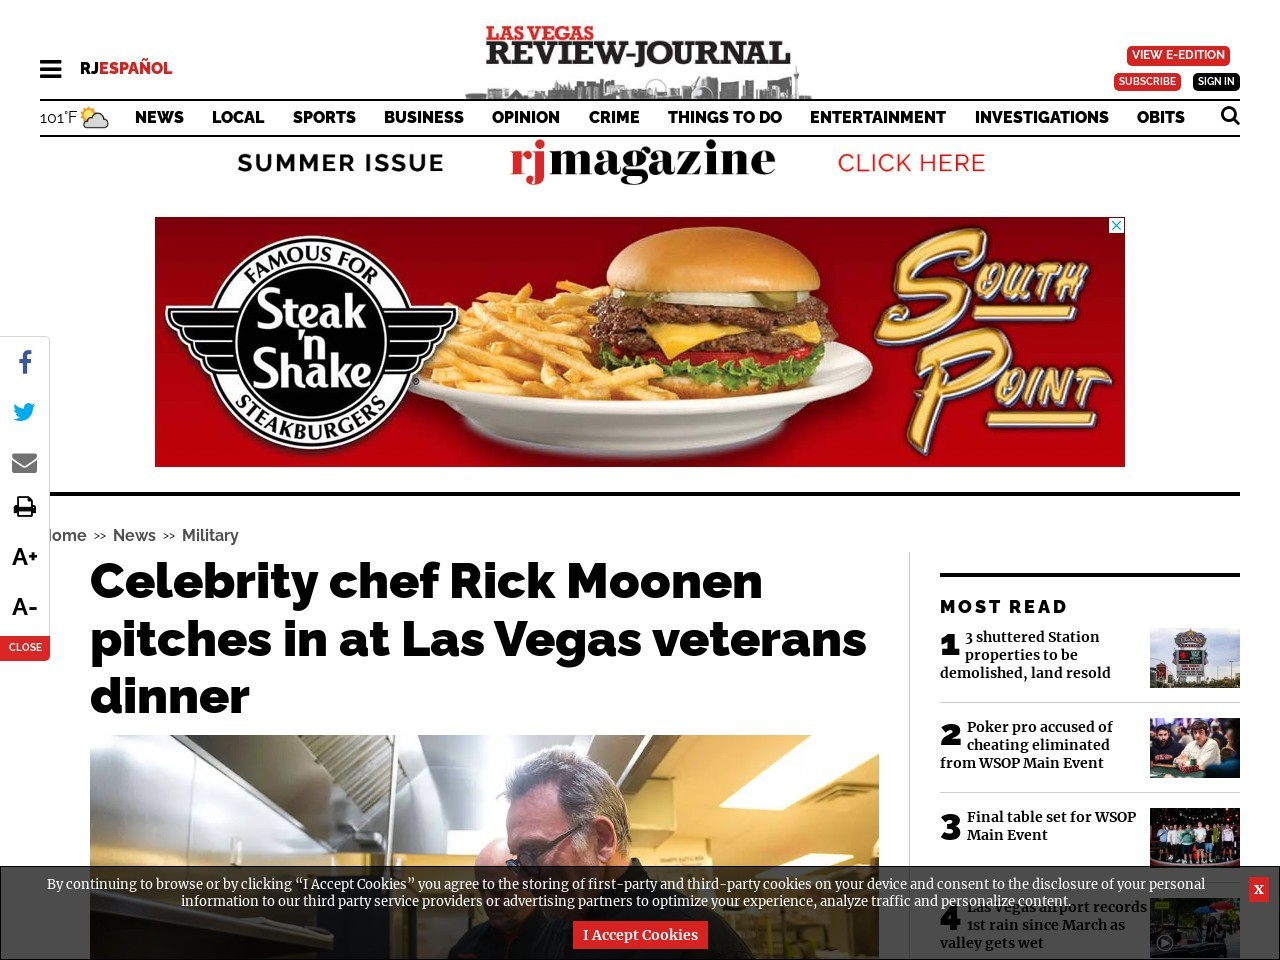 Celebrity chef Rick Moonen pitches in at Las Vegas veterans dinner